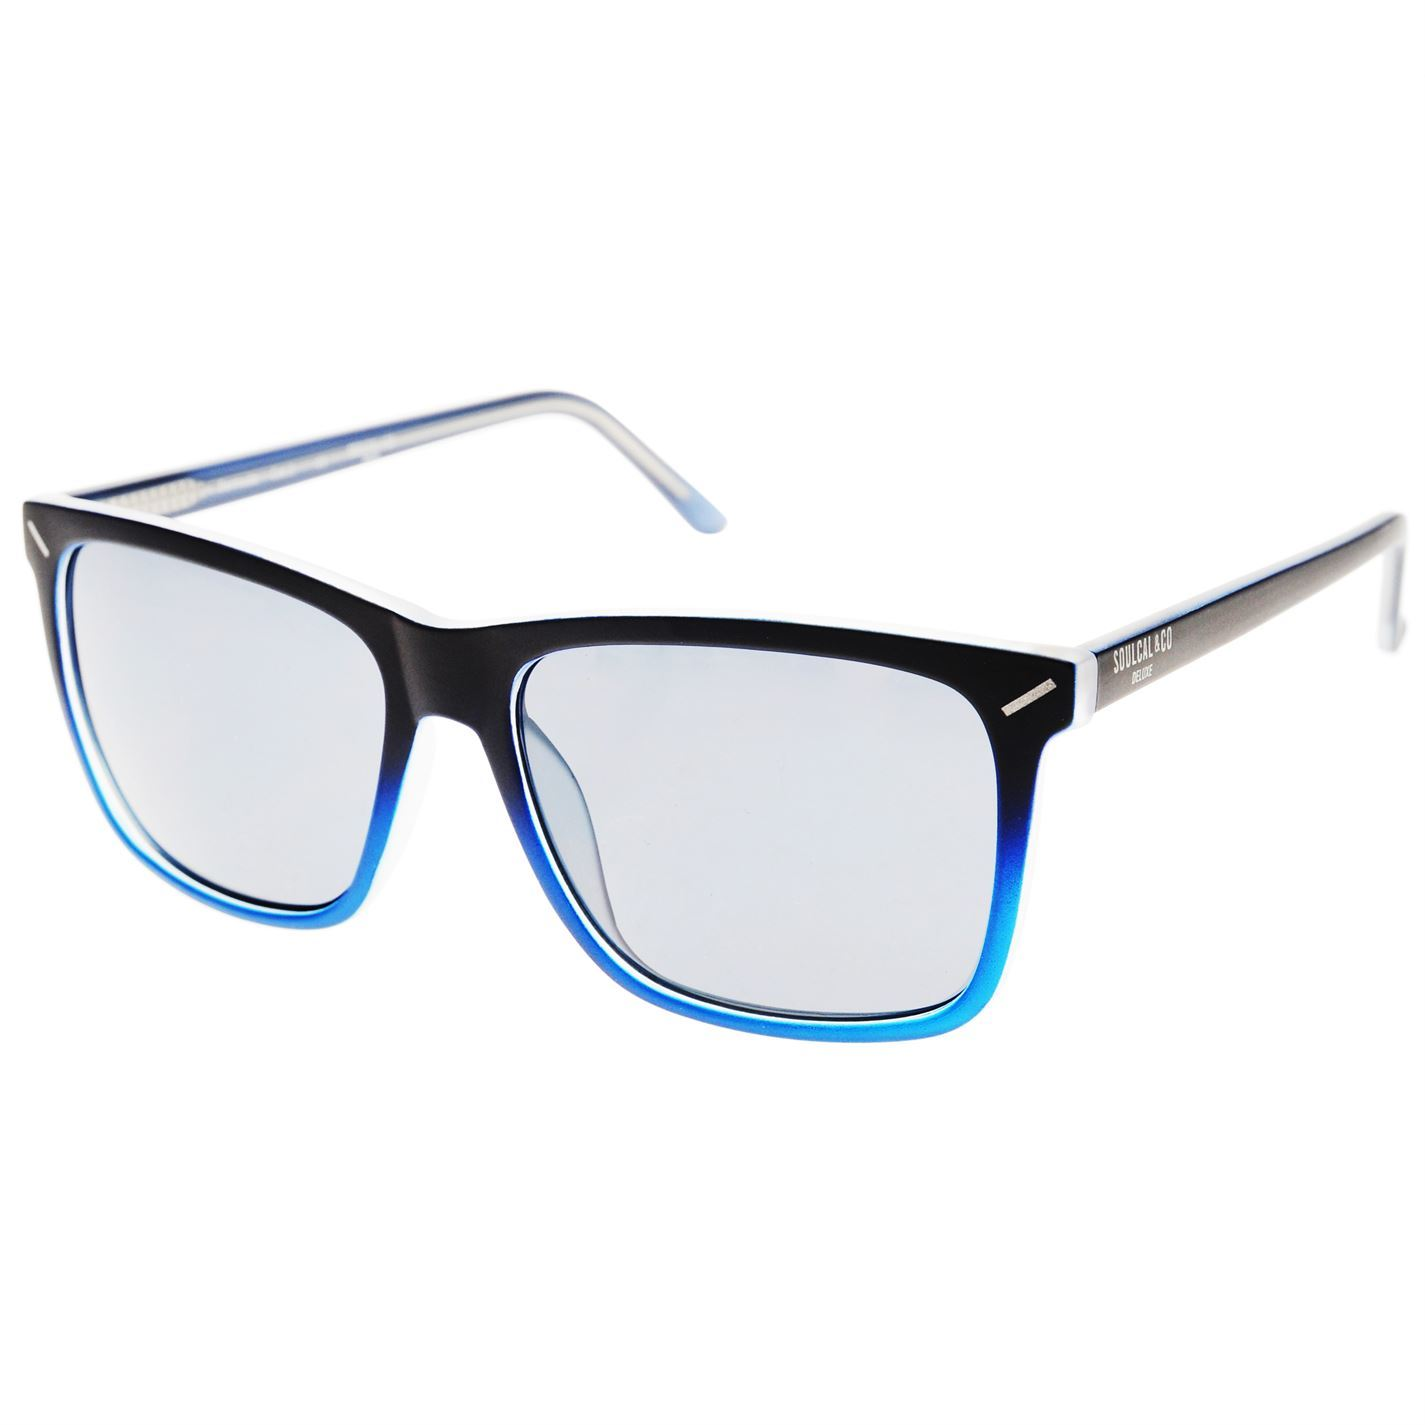 7b22296d2f Soulcal mens bermuda sunglasses plastic frame tinted lens jpg 1425x1425 Bermuda  sunglasses